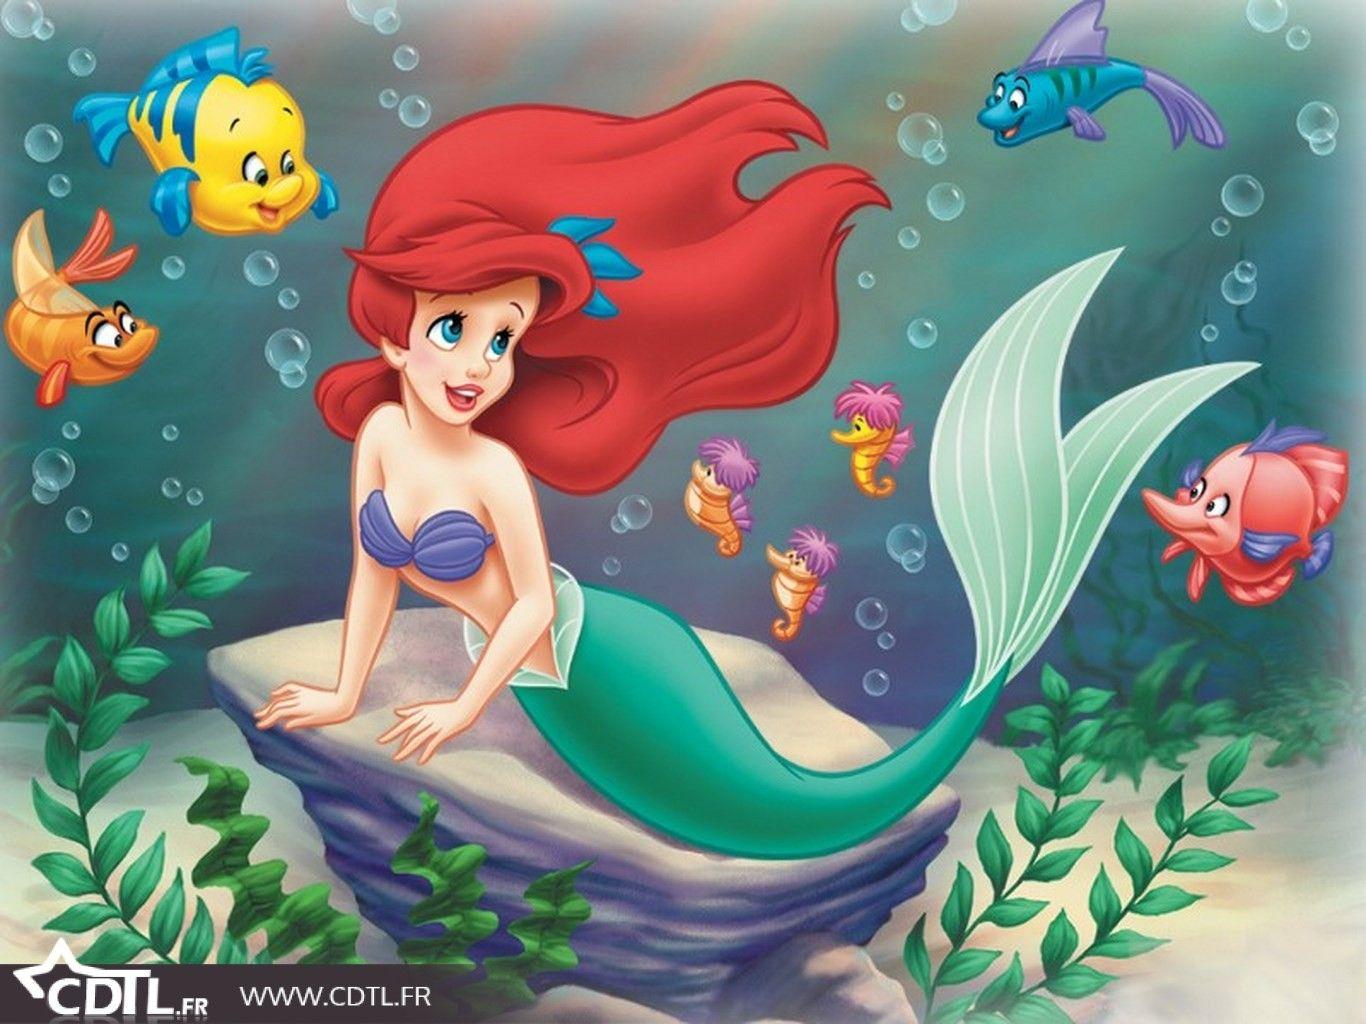 Top 10 des dessins animes disney 2 dessin anim - Musique de dessin anime walt disney gratuit ...